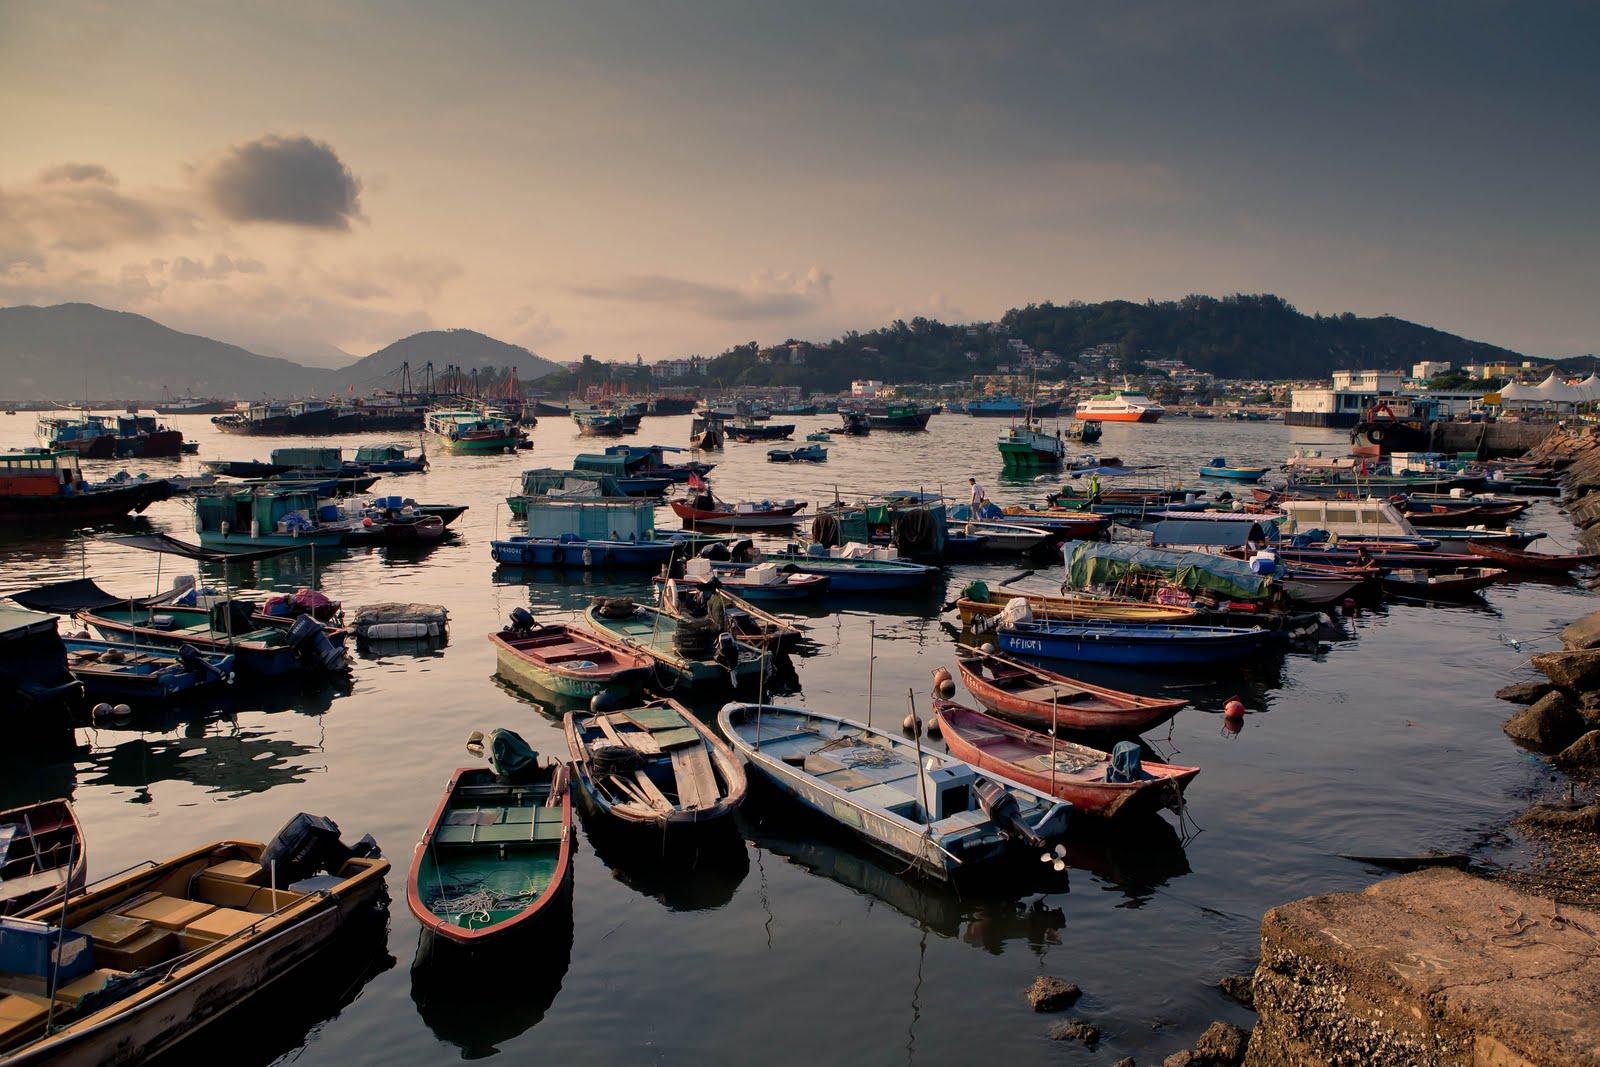 cheung chau Cheung chau is a beautiful, fascinating south china sea island, in western hong kong 長洲,它是一個美麗、迷人的小島,位於香港的西南面。.